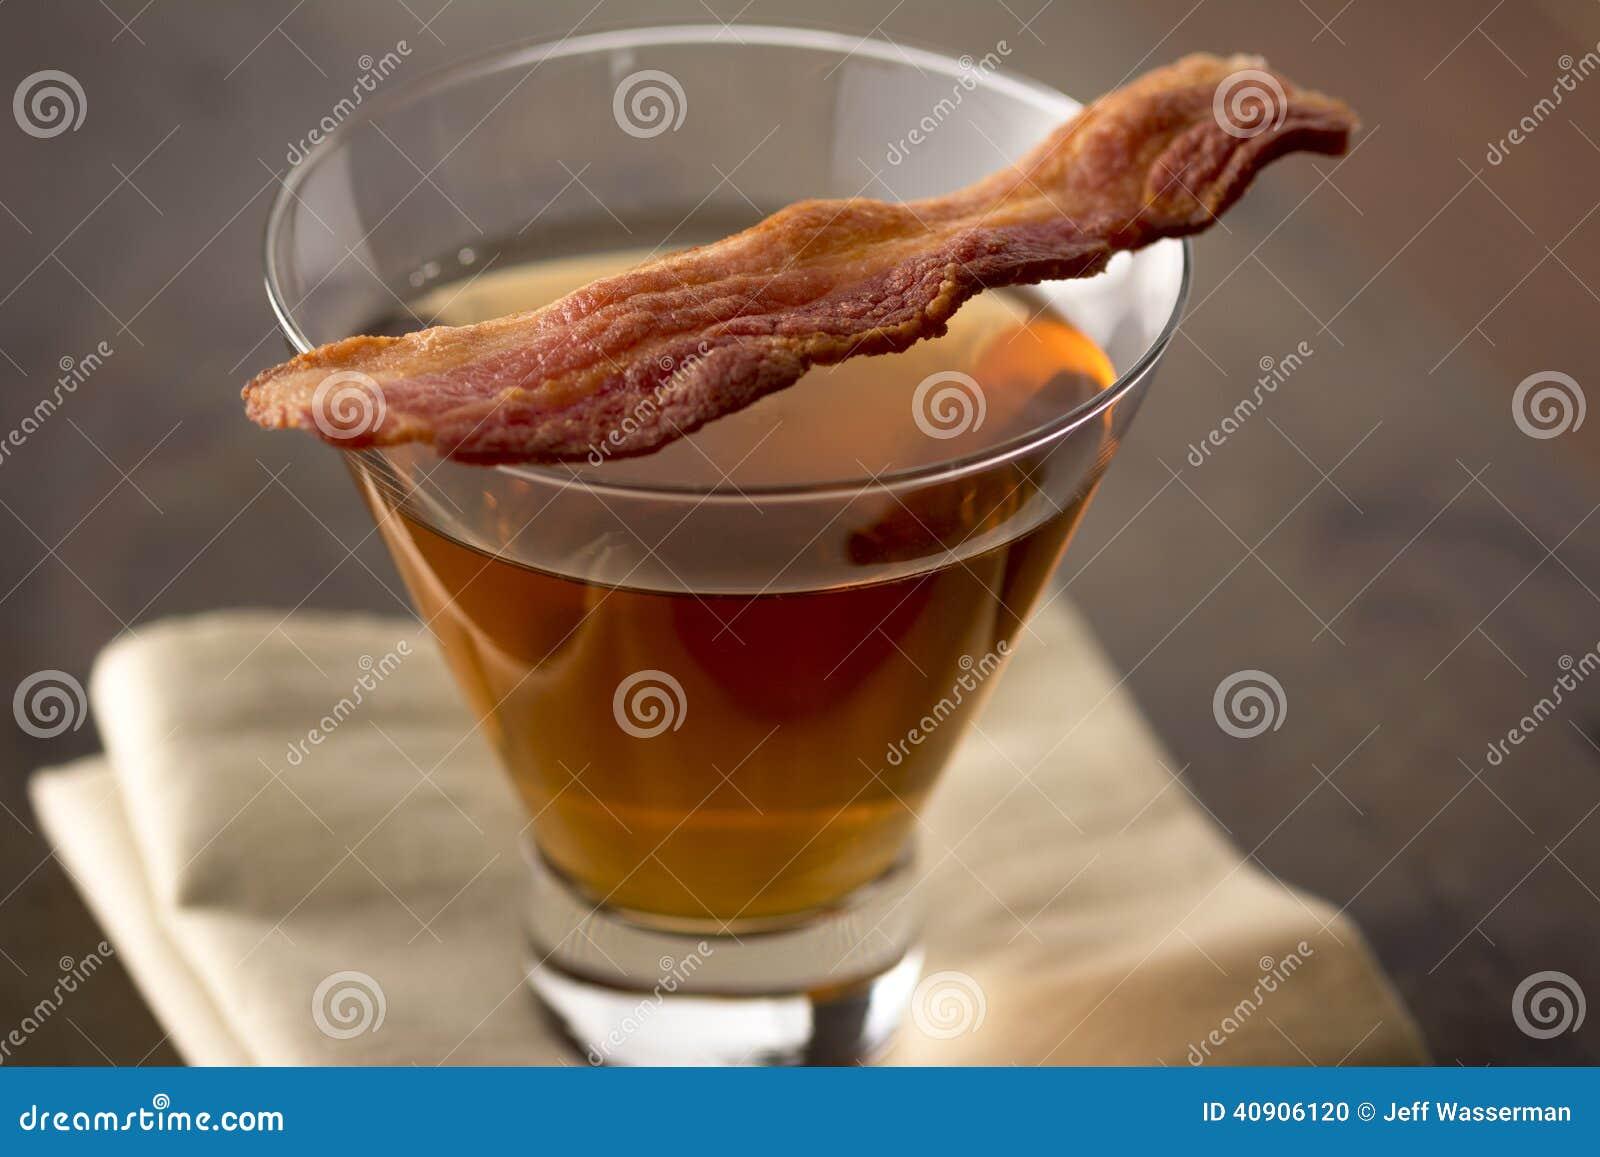 Baconwhiskycoctail